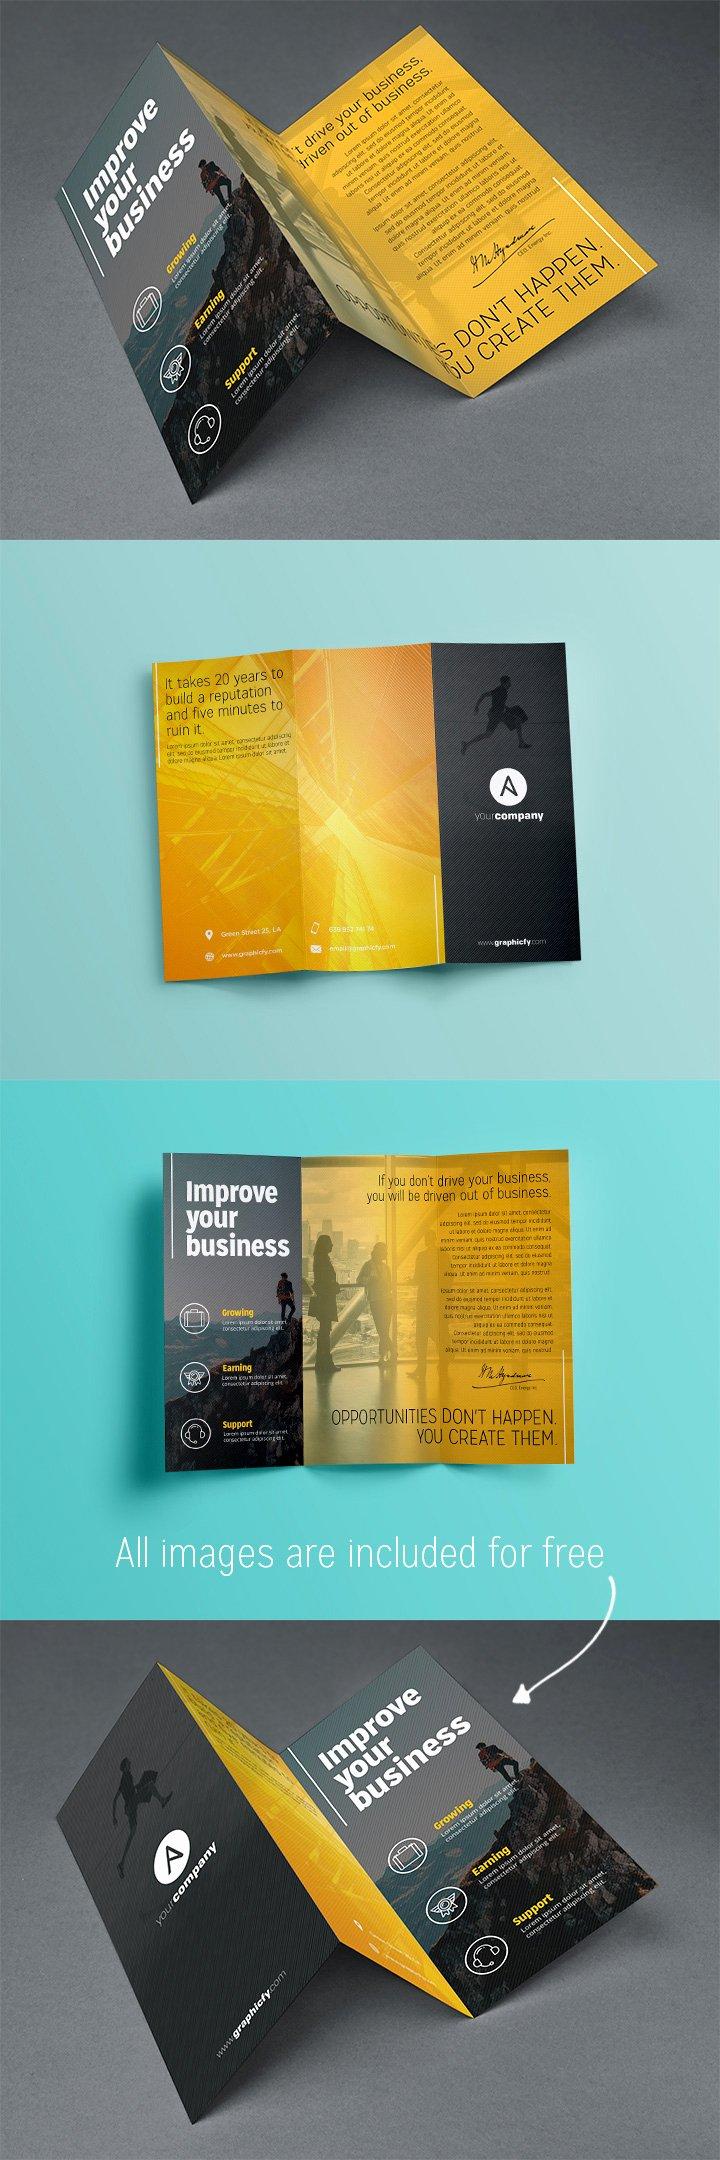 Tri Fold Brochure Free Template Beautiful Tri Fold Brochure Template Psd Brochure Templates